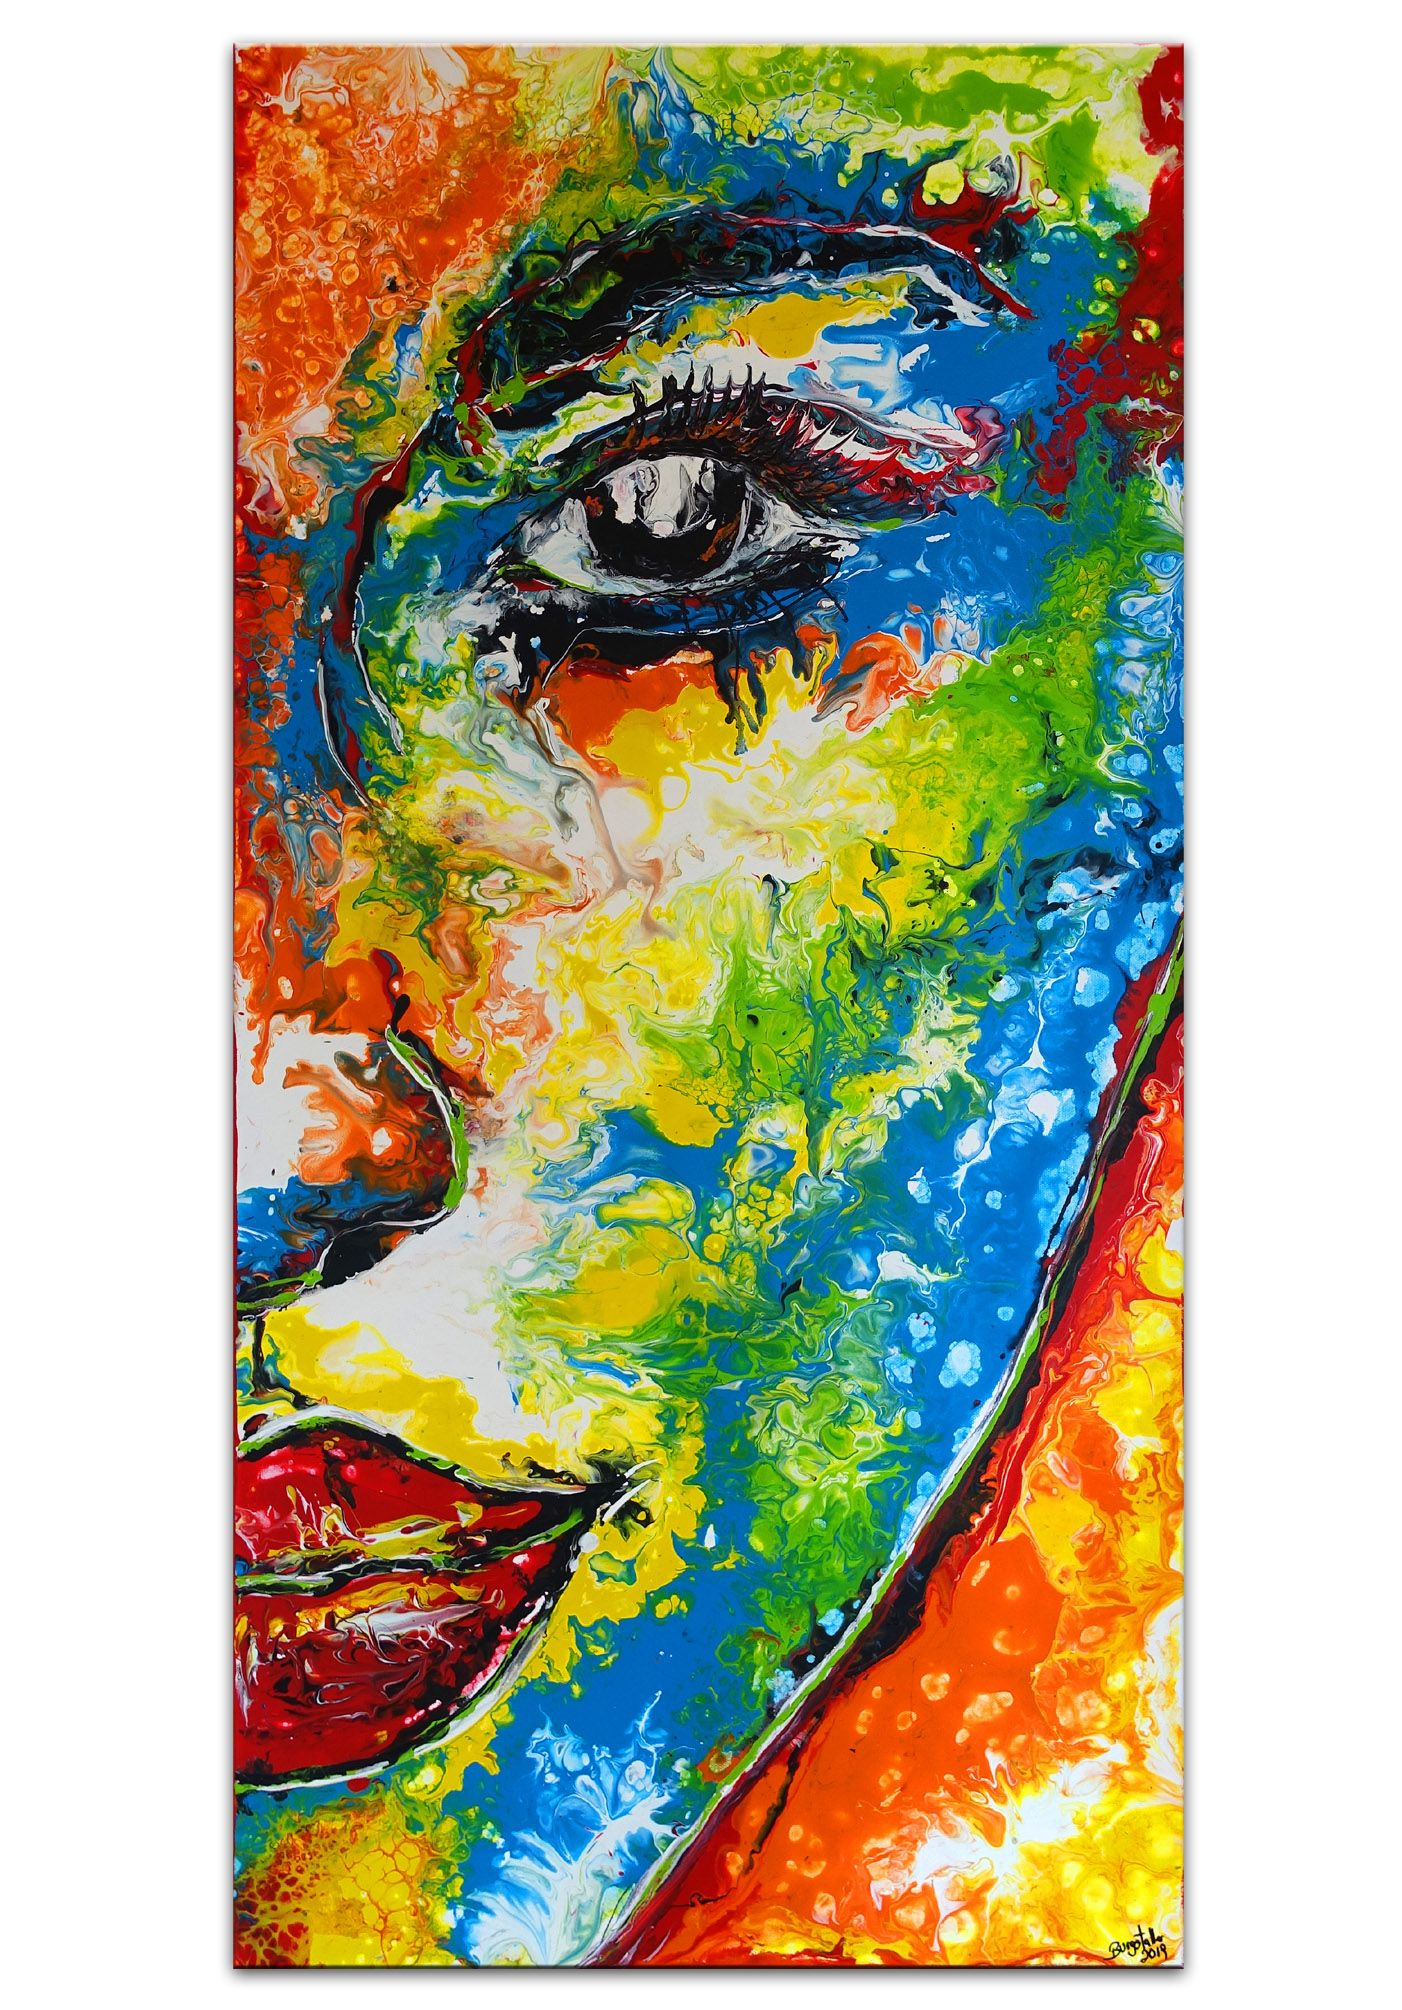 abstraktes gesicht bunt portrat malerei wandbild abstrakte kunst gemalde kunstproduktion bilder gold moderne abstrakt